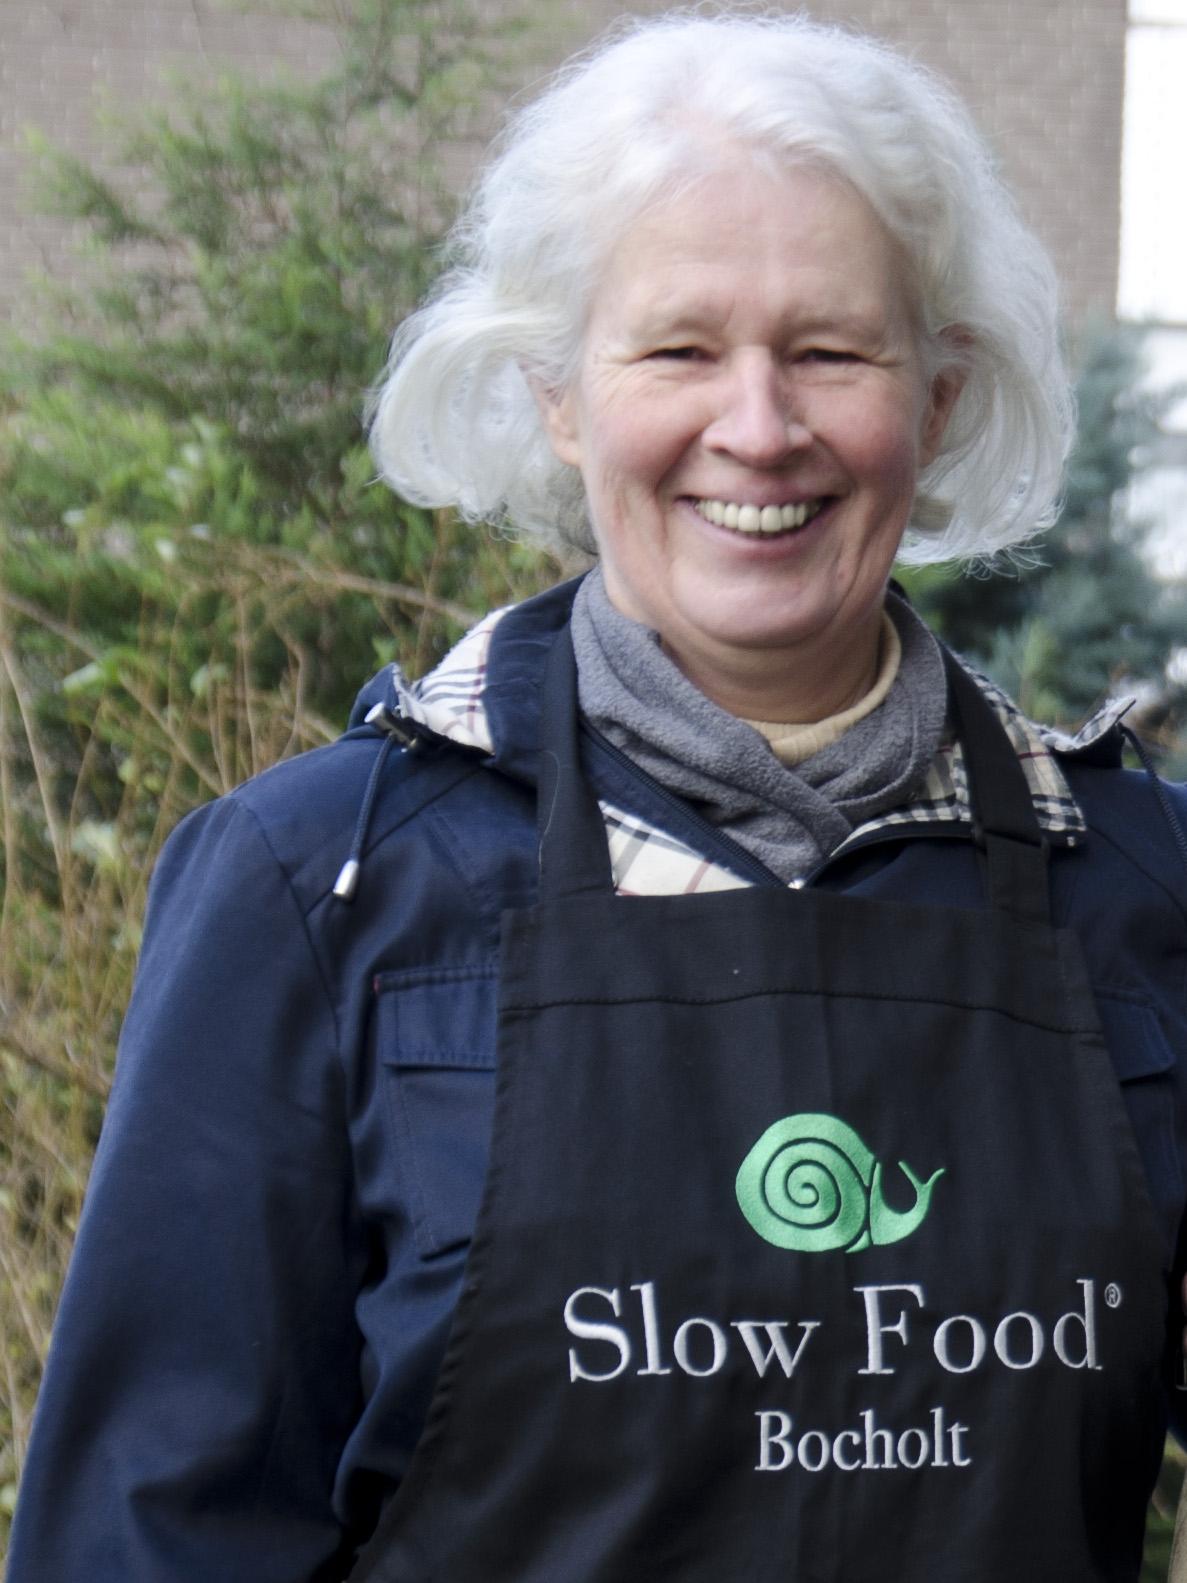 kochen_Homepage von Slow Food Bocholt, Convivium Bocholt